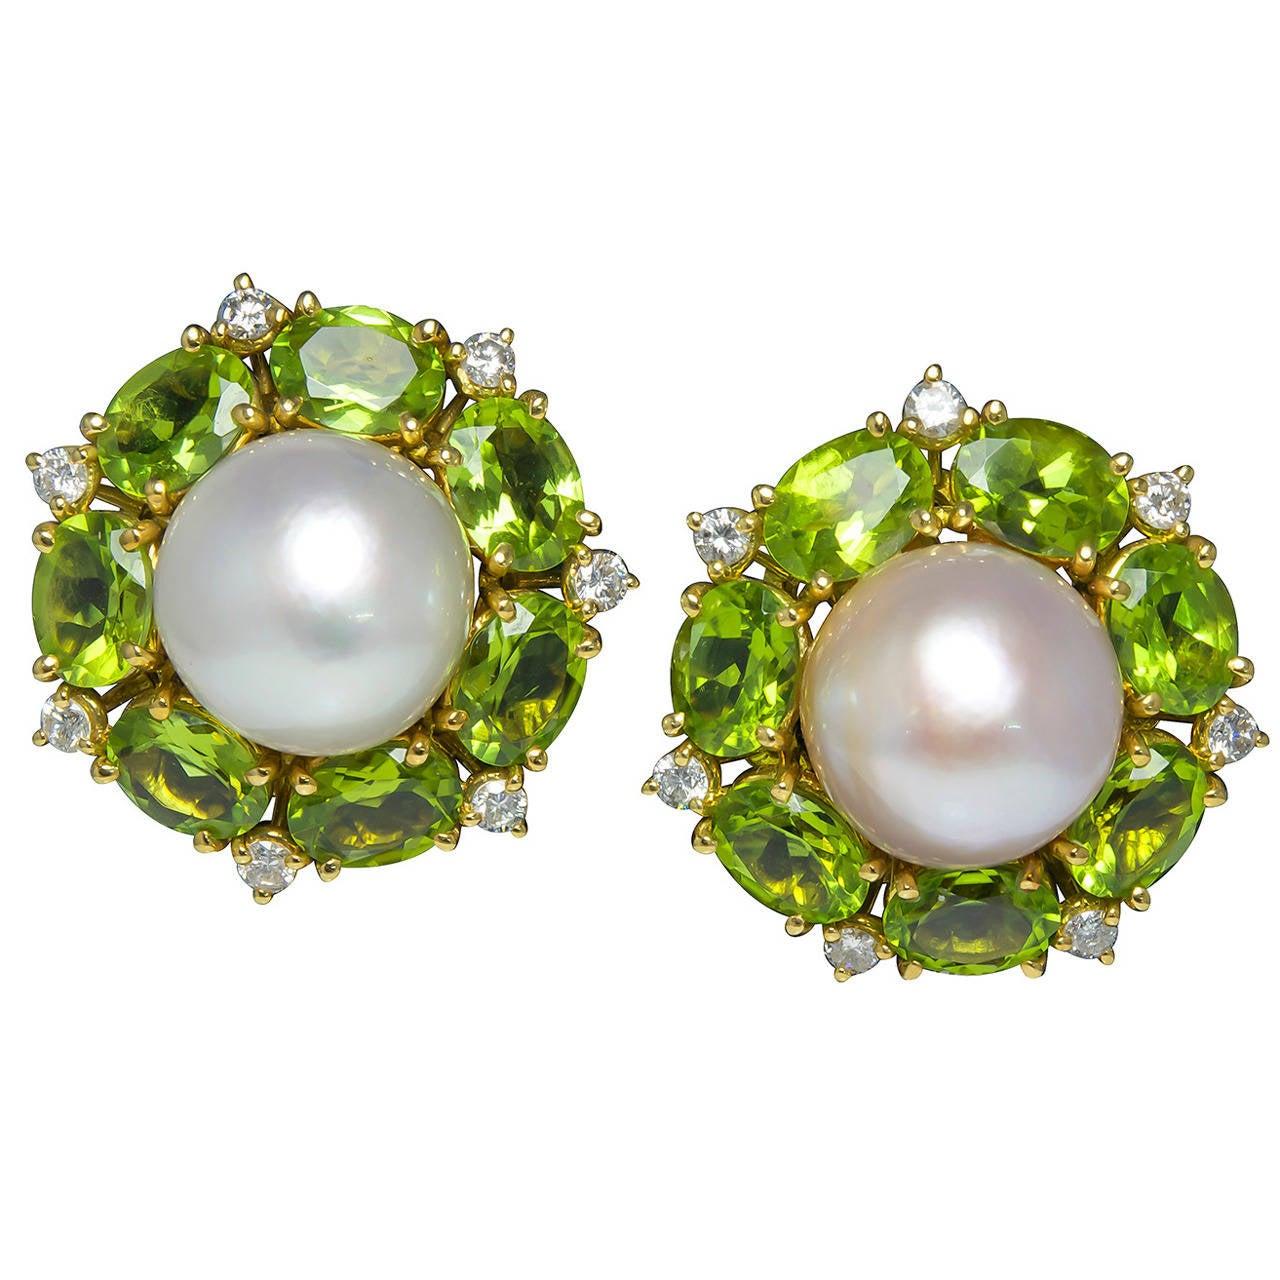 seaman schepps peridot pearl clip on earrings at 1stdibs